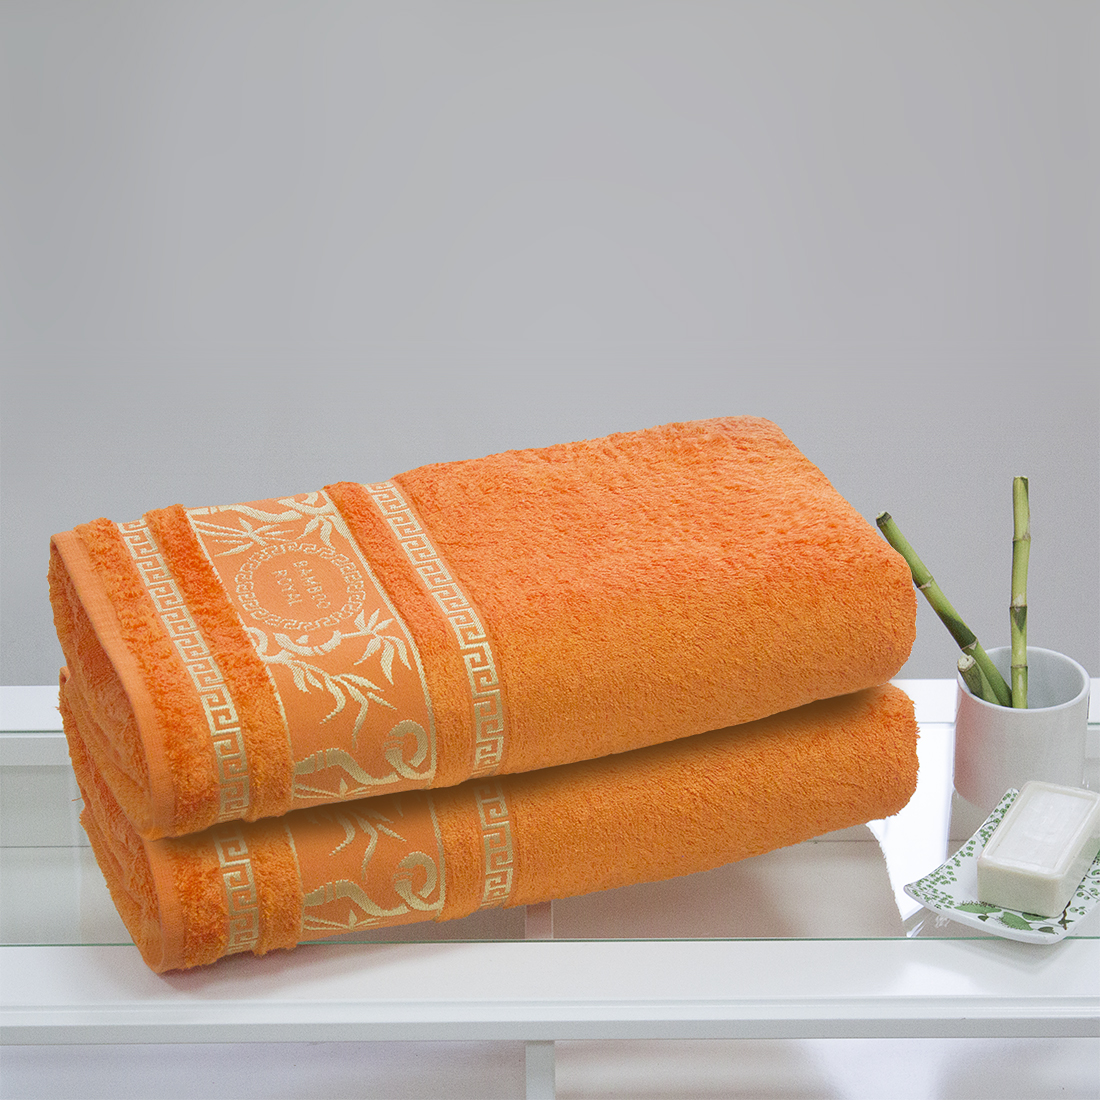 Полотенца Juanna Полотенце Роял Цвет: Оранжевый (70х140 см - 2 шт) набор из 3 полотенец merzuka sakura 50х90 2 70х140 8432 оранжевый